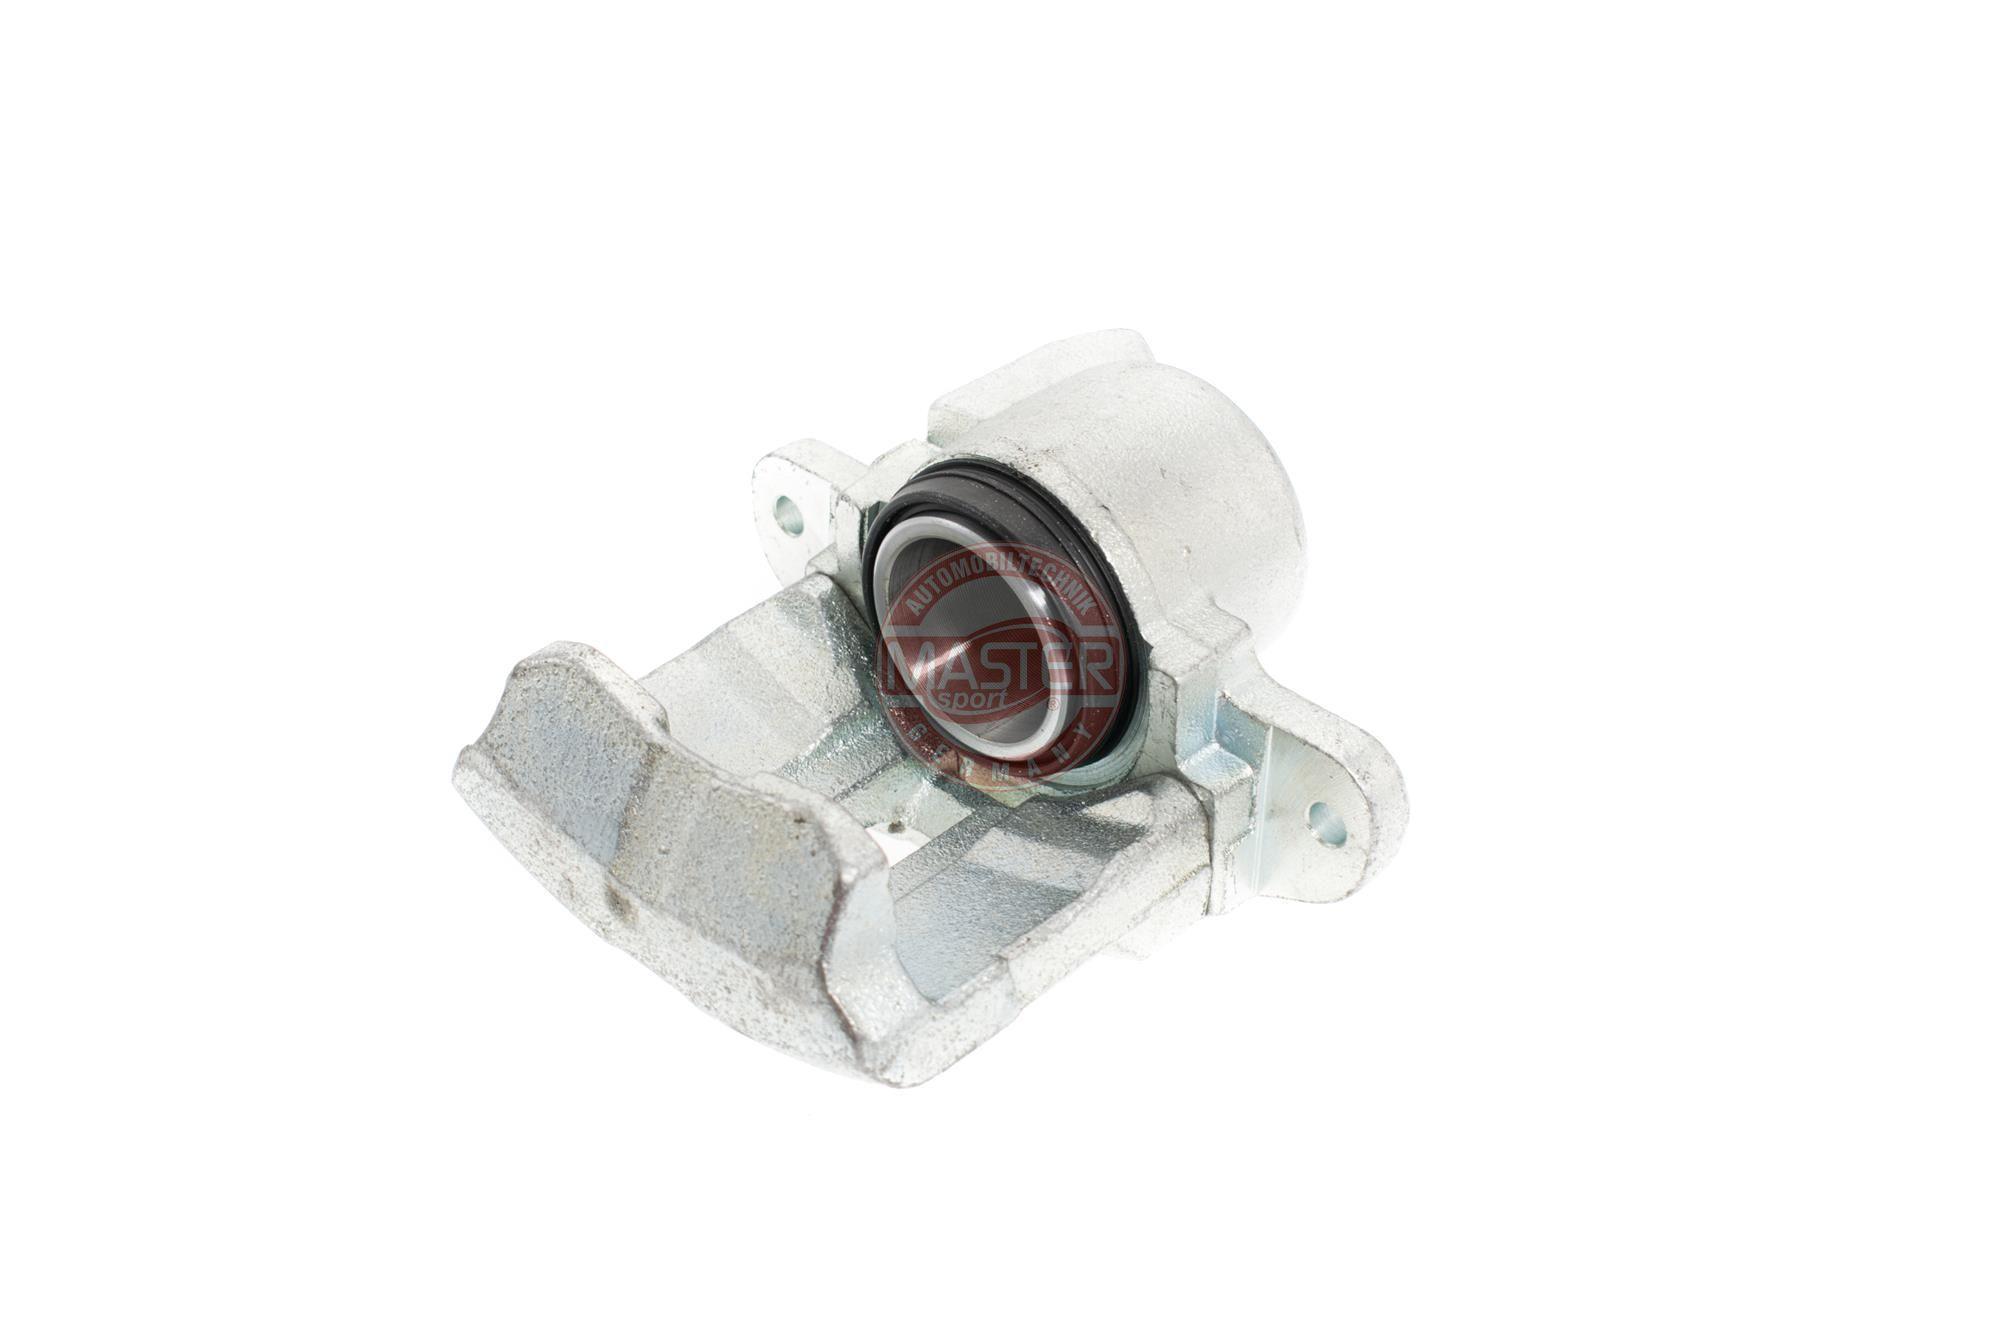 Bremszange 24348116115-PCS-MS MASTER-SPORT 24348116115-PCS-MS in Original Qualität